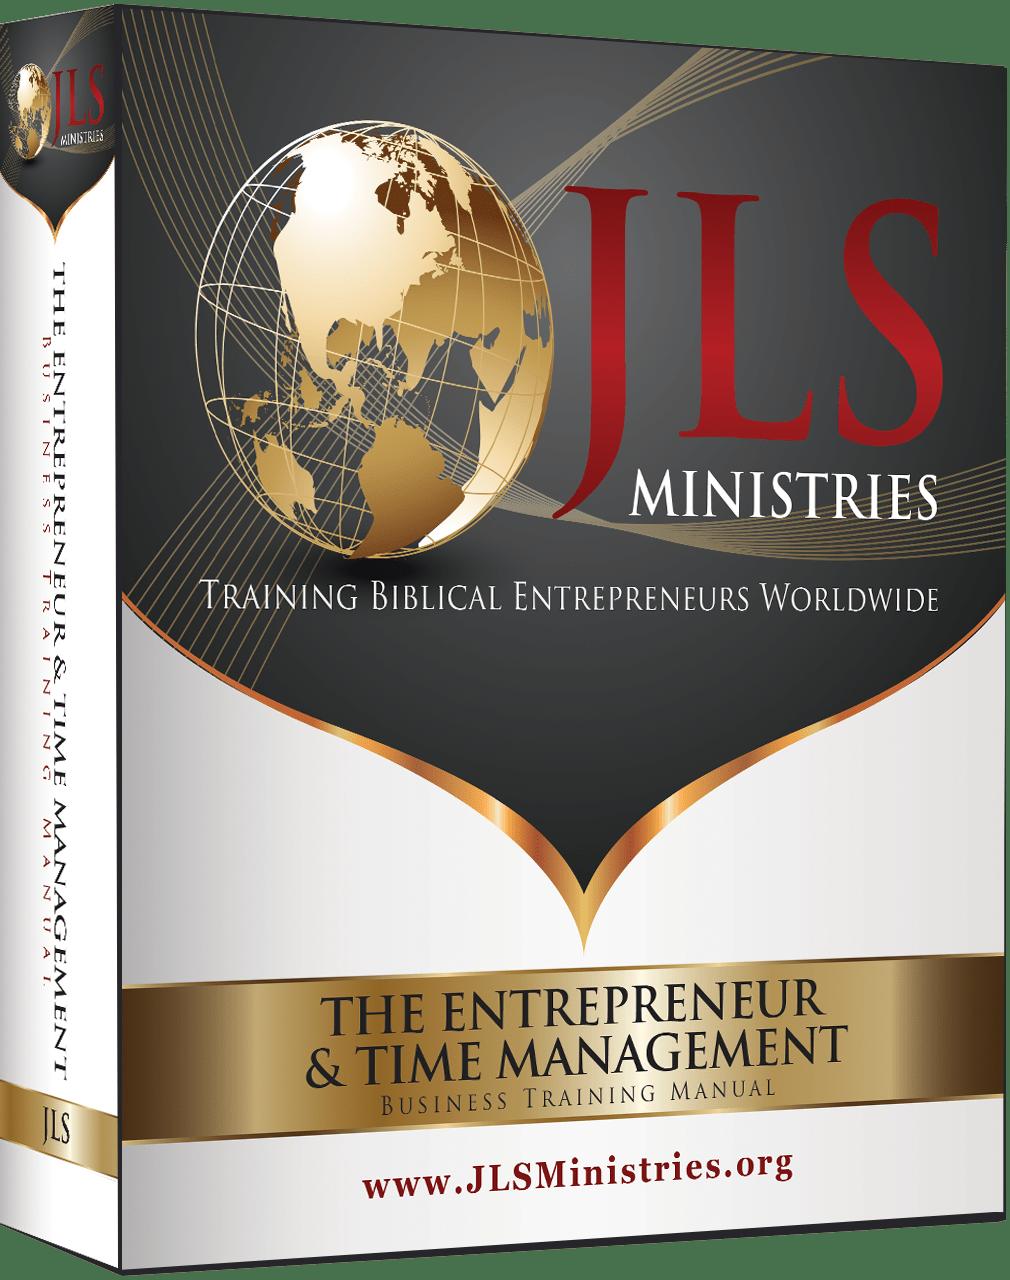 tm-jls0108_business-training-manual